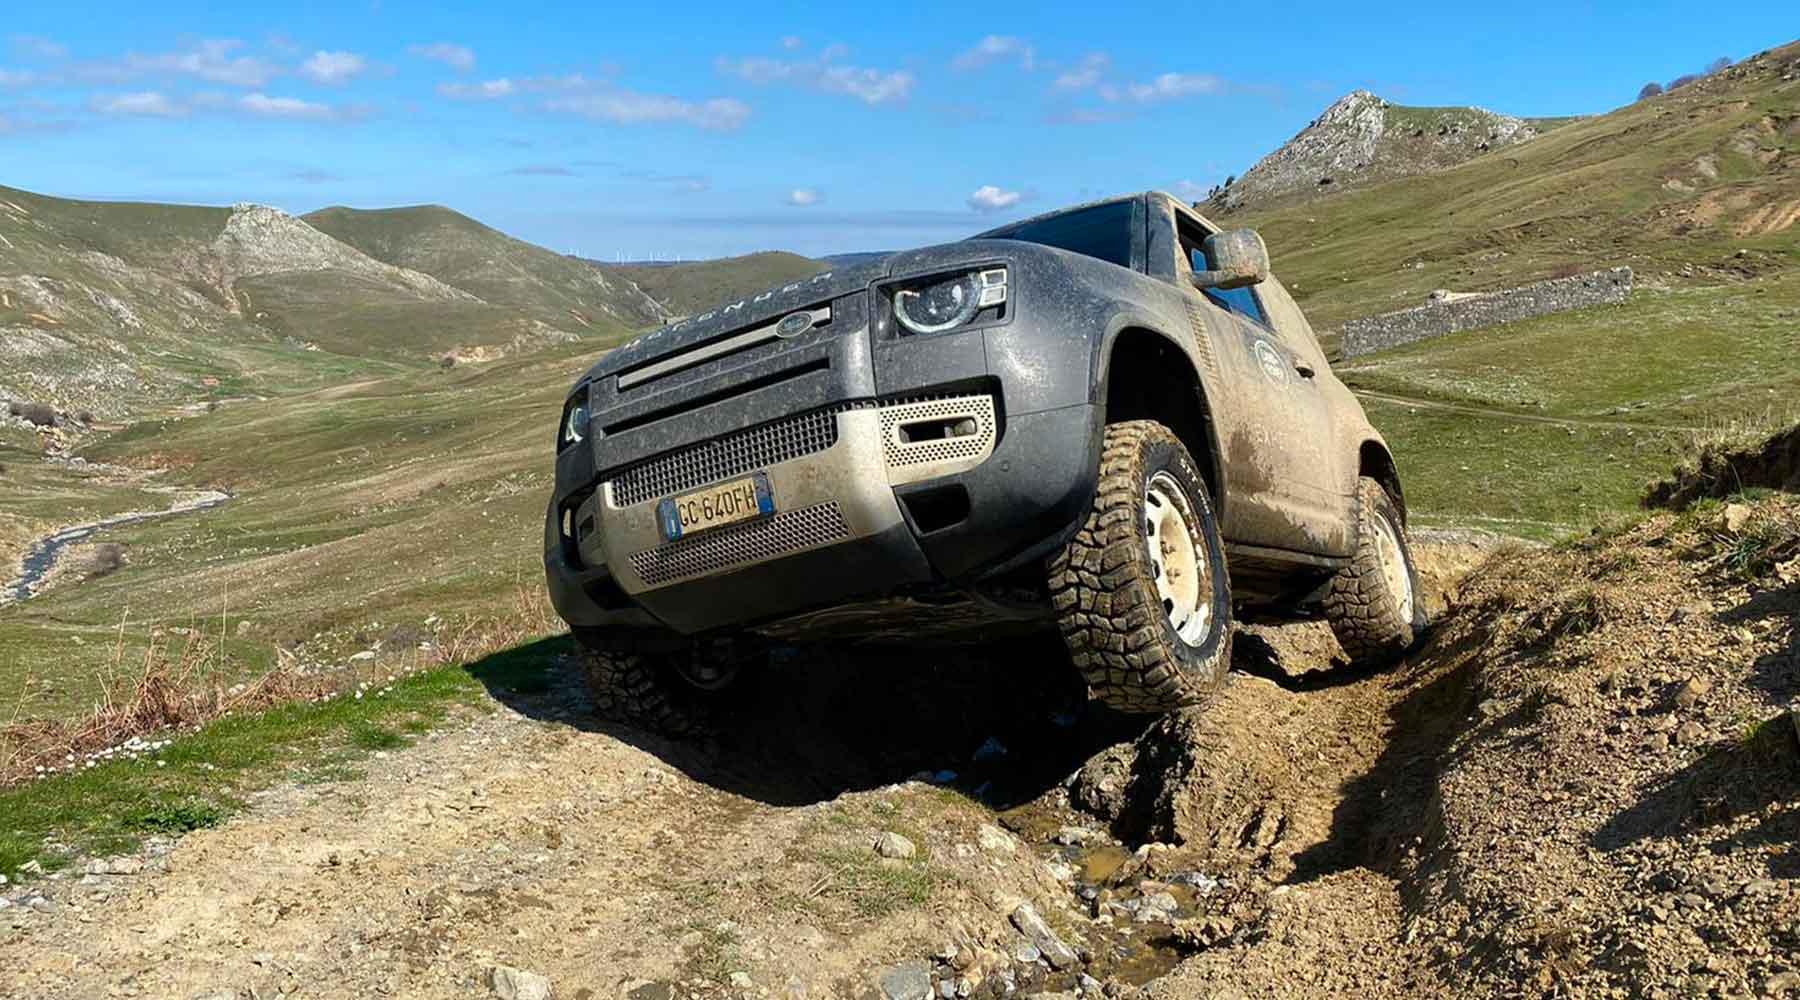 land_rover_tour_sicilia_land_rover_experience_italia_registro_italiano_land_rover